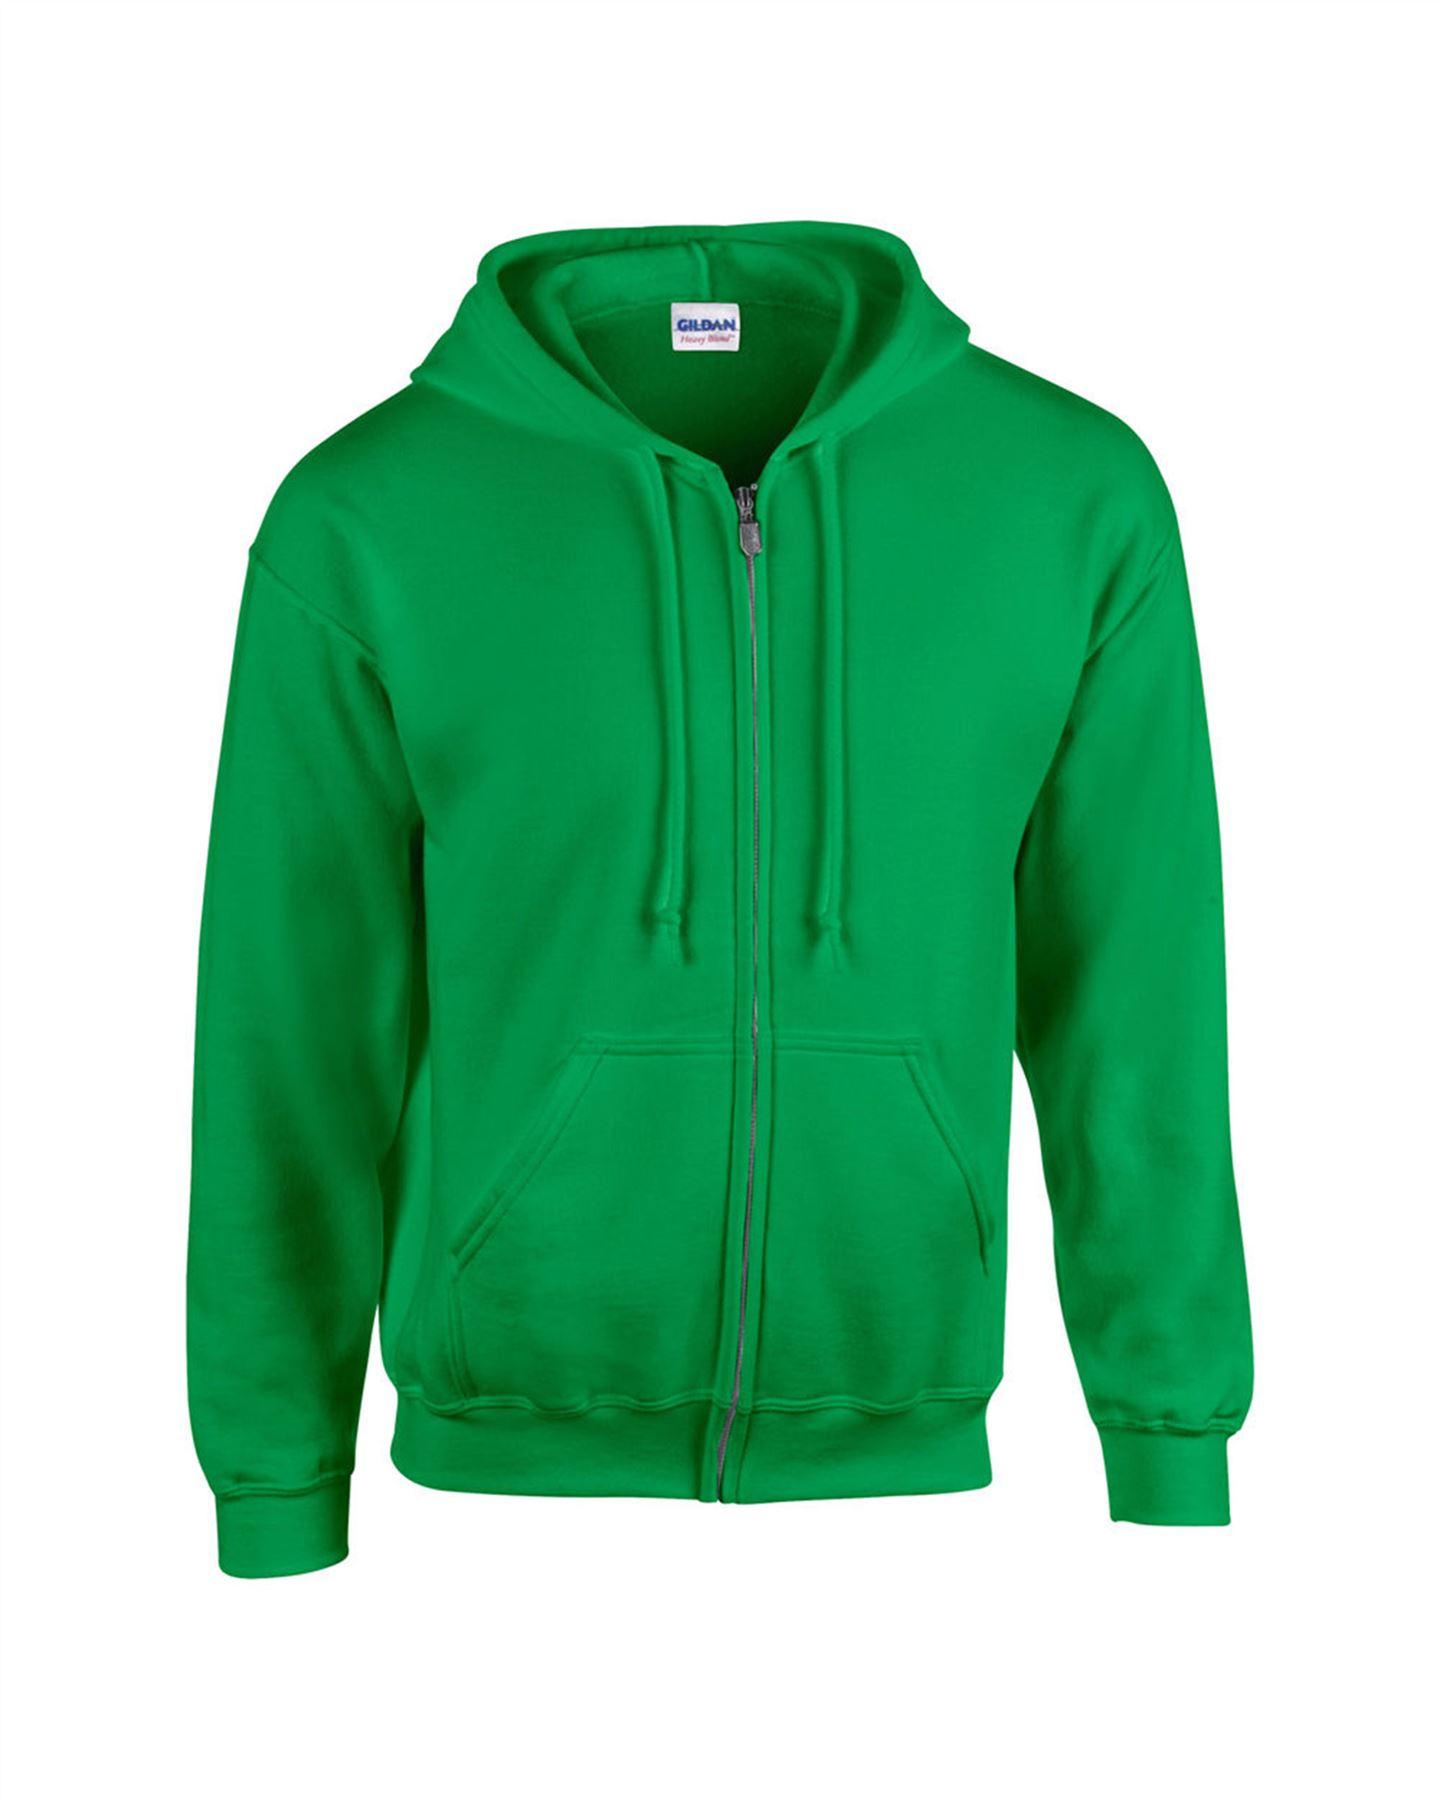 d390baa7859 Gildan Plain Mens Kids Blank Fleece Full Zip Hooded Heavy Blend ...